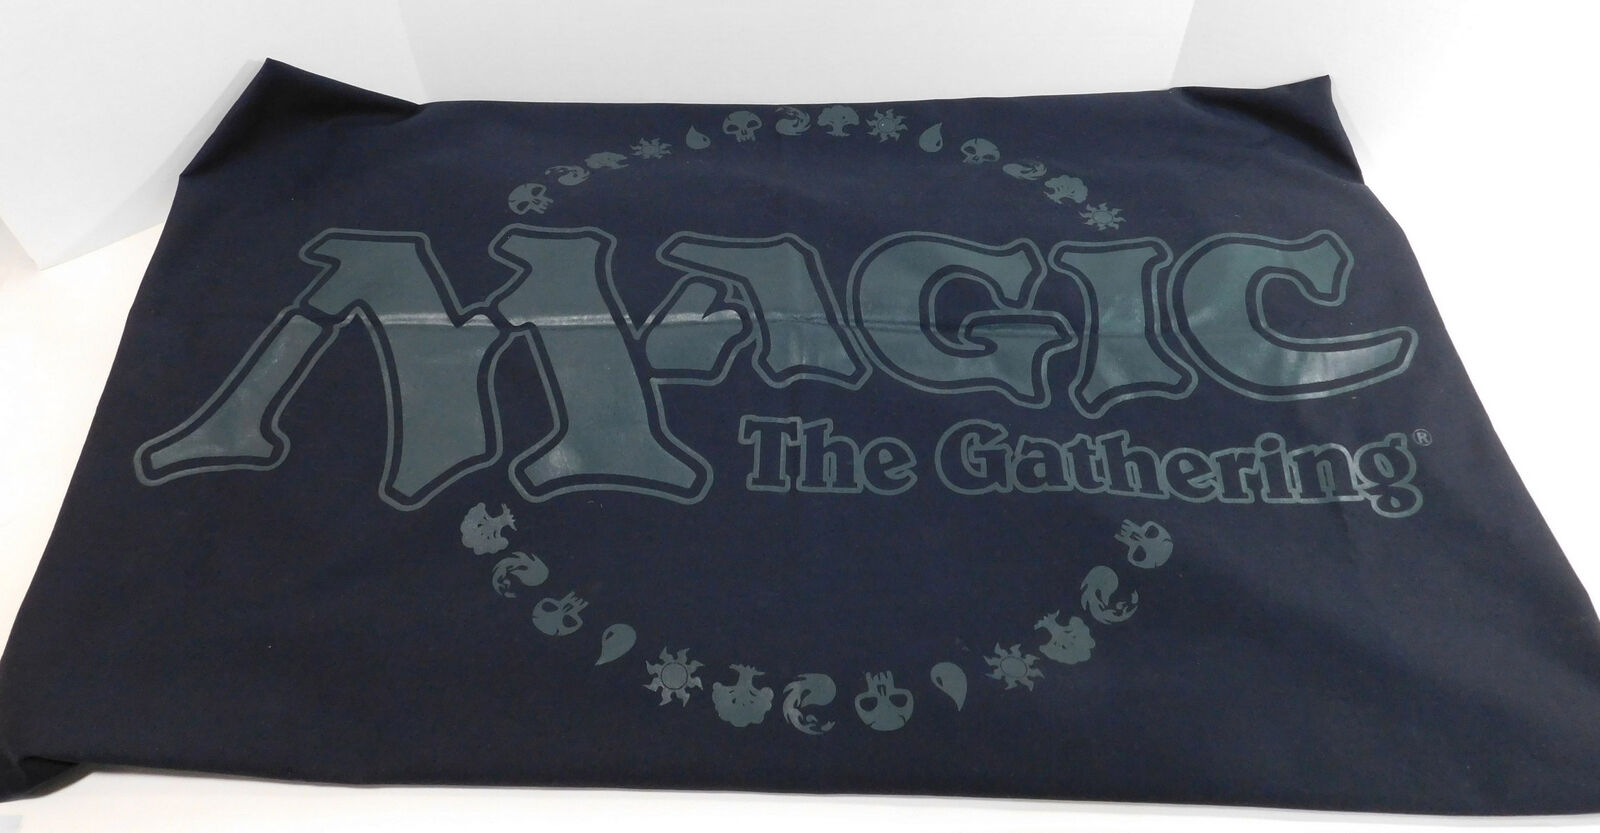 1998 Magic The Gathering Tournament Table Cloth 106  x 58